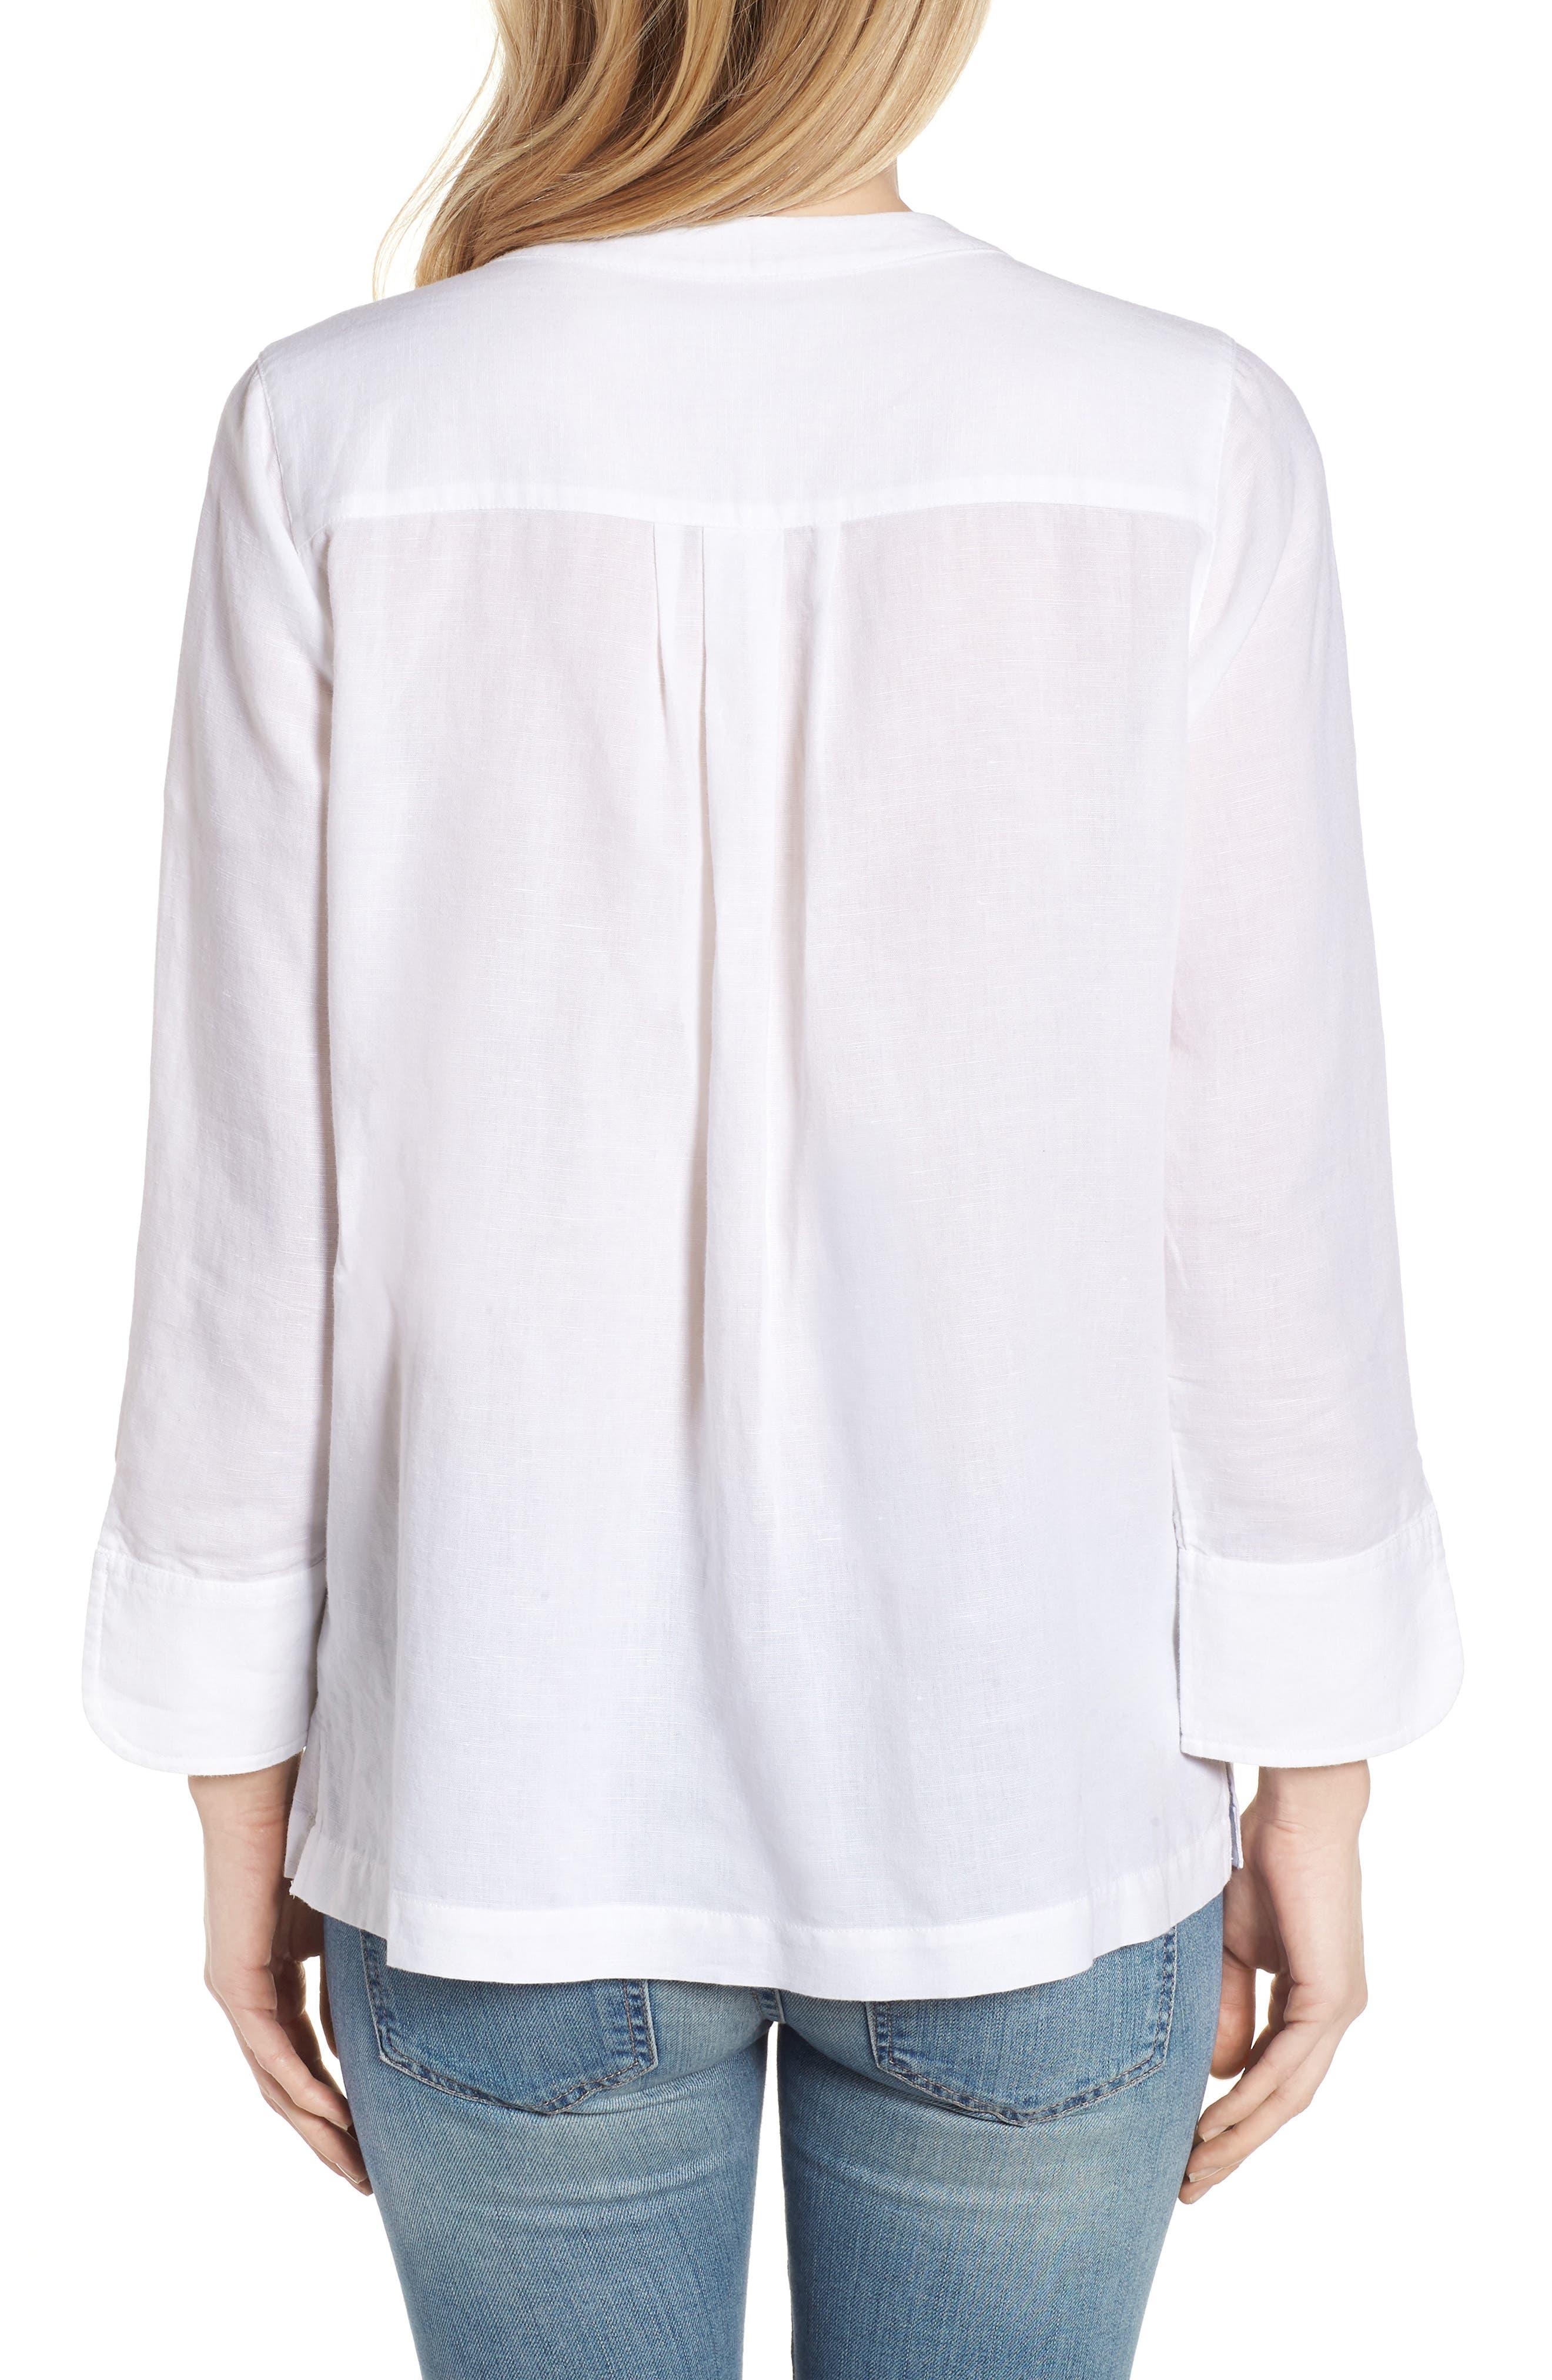 Embellished Tunic Top,                             Alternate thumbnail 2, color,                             White Cap